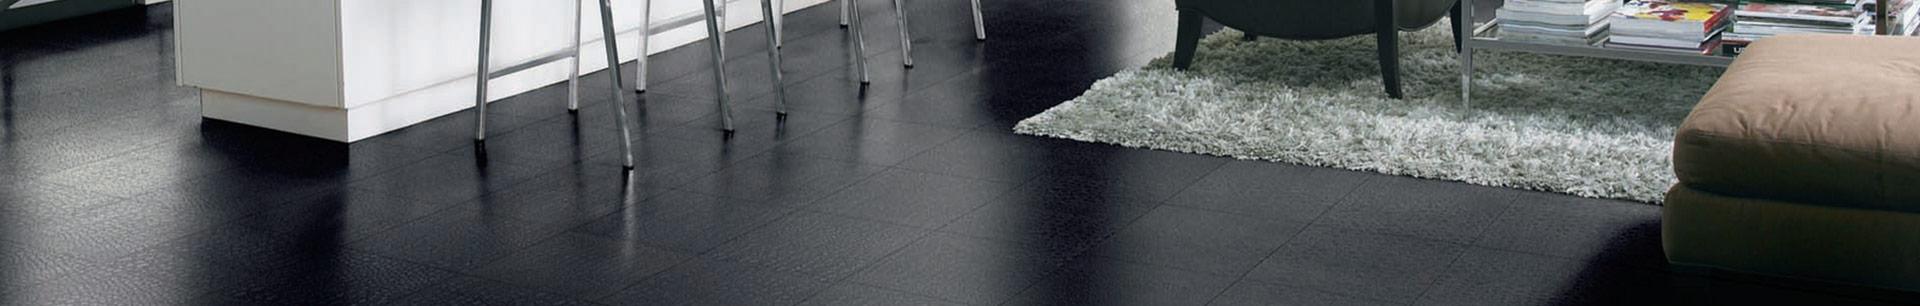 Leather Cork-backed Flooring